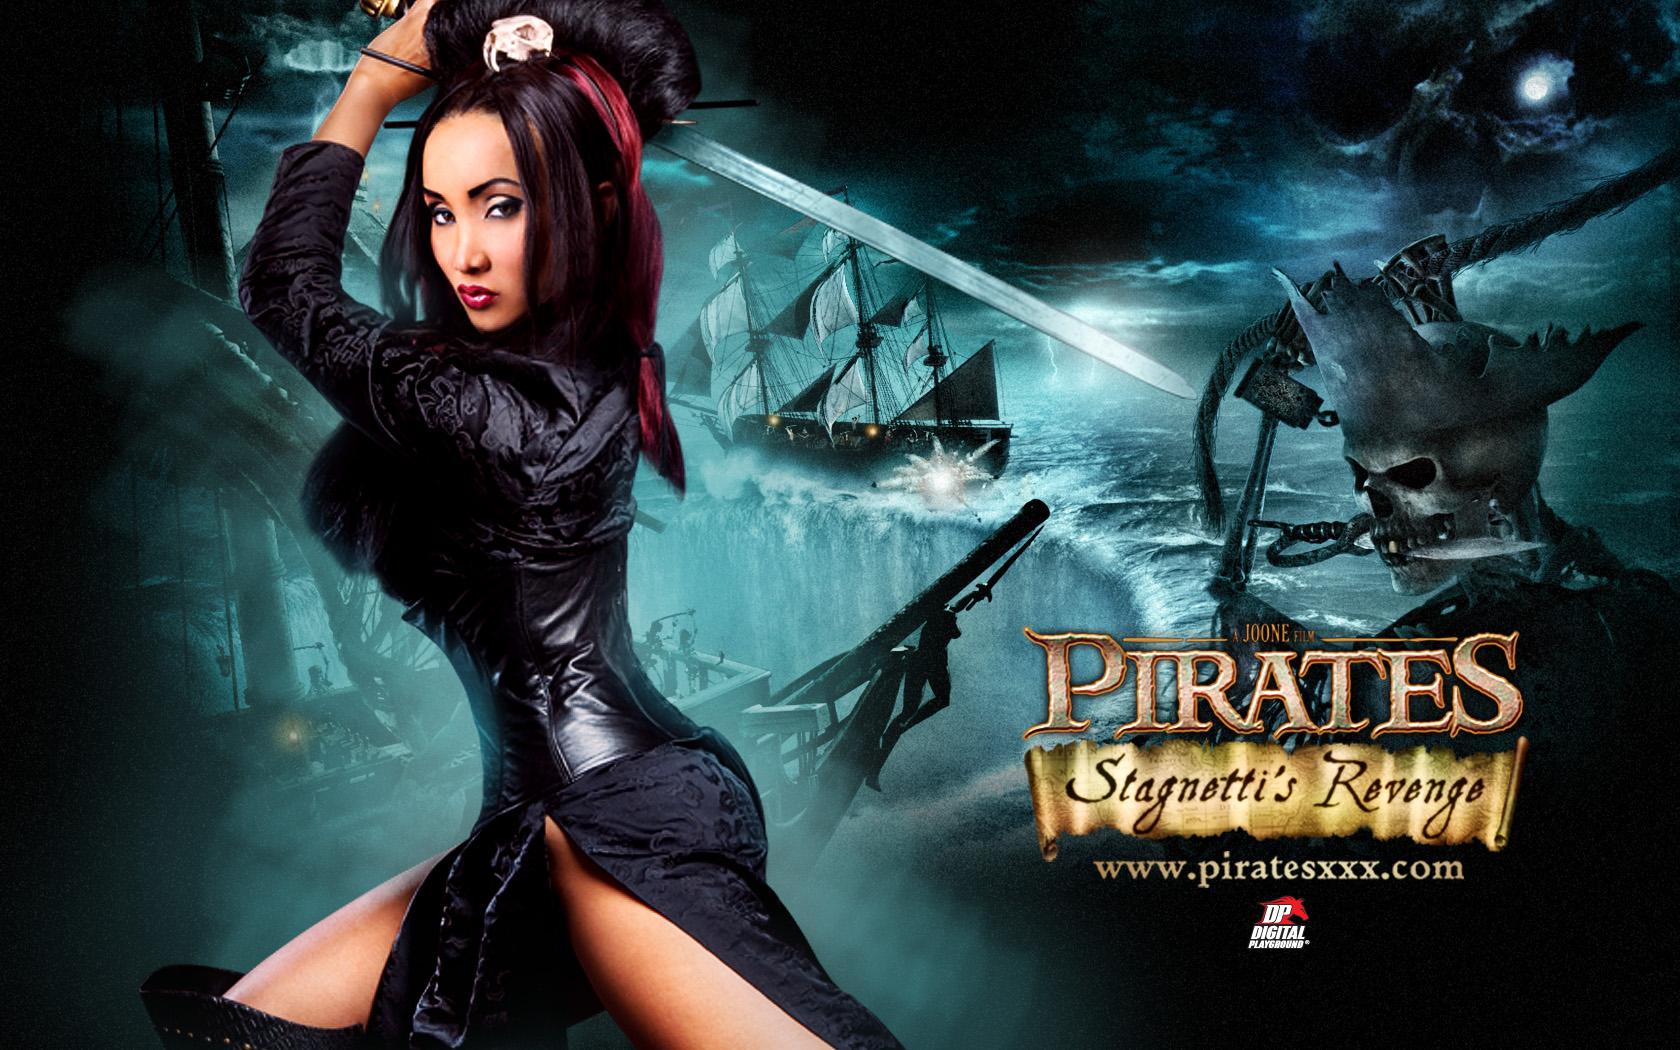 Pirate of caribbean xxx porno movies